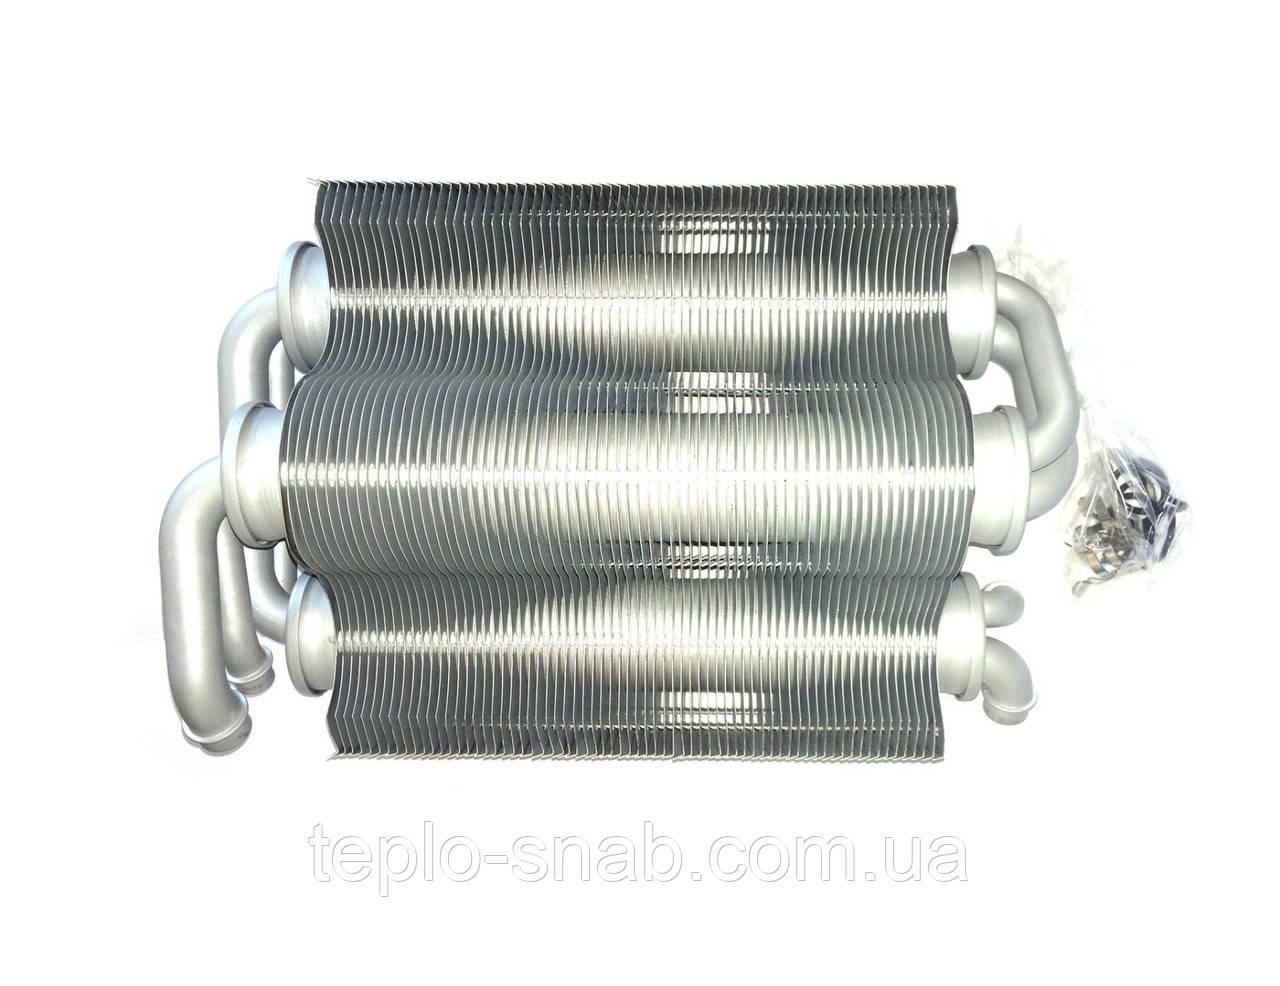 Теплообмінник Ferroli Domitech F24, Domitech F 24 D, Easytech F24. 39828290